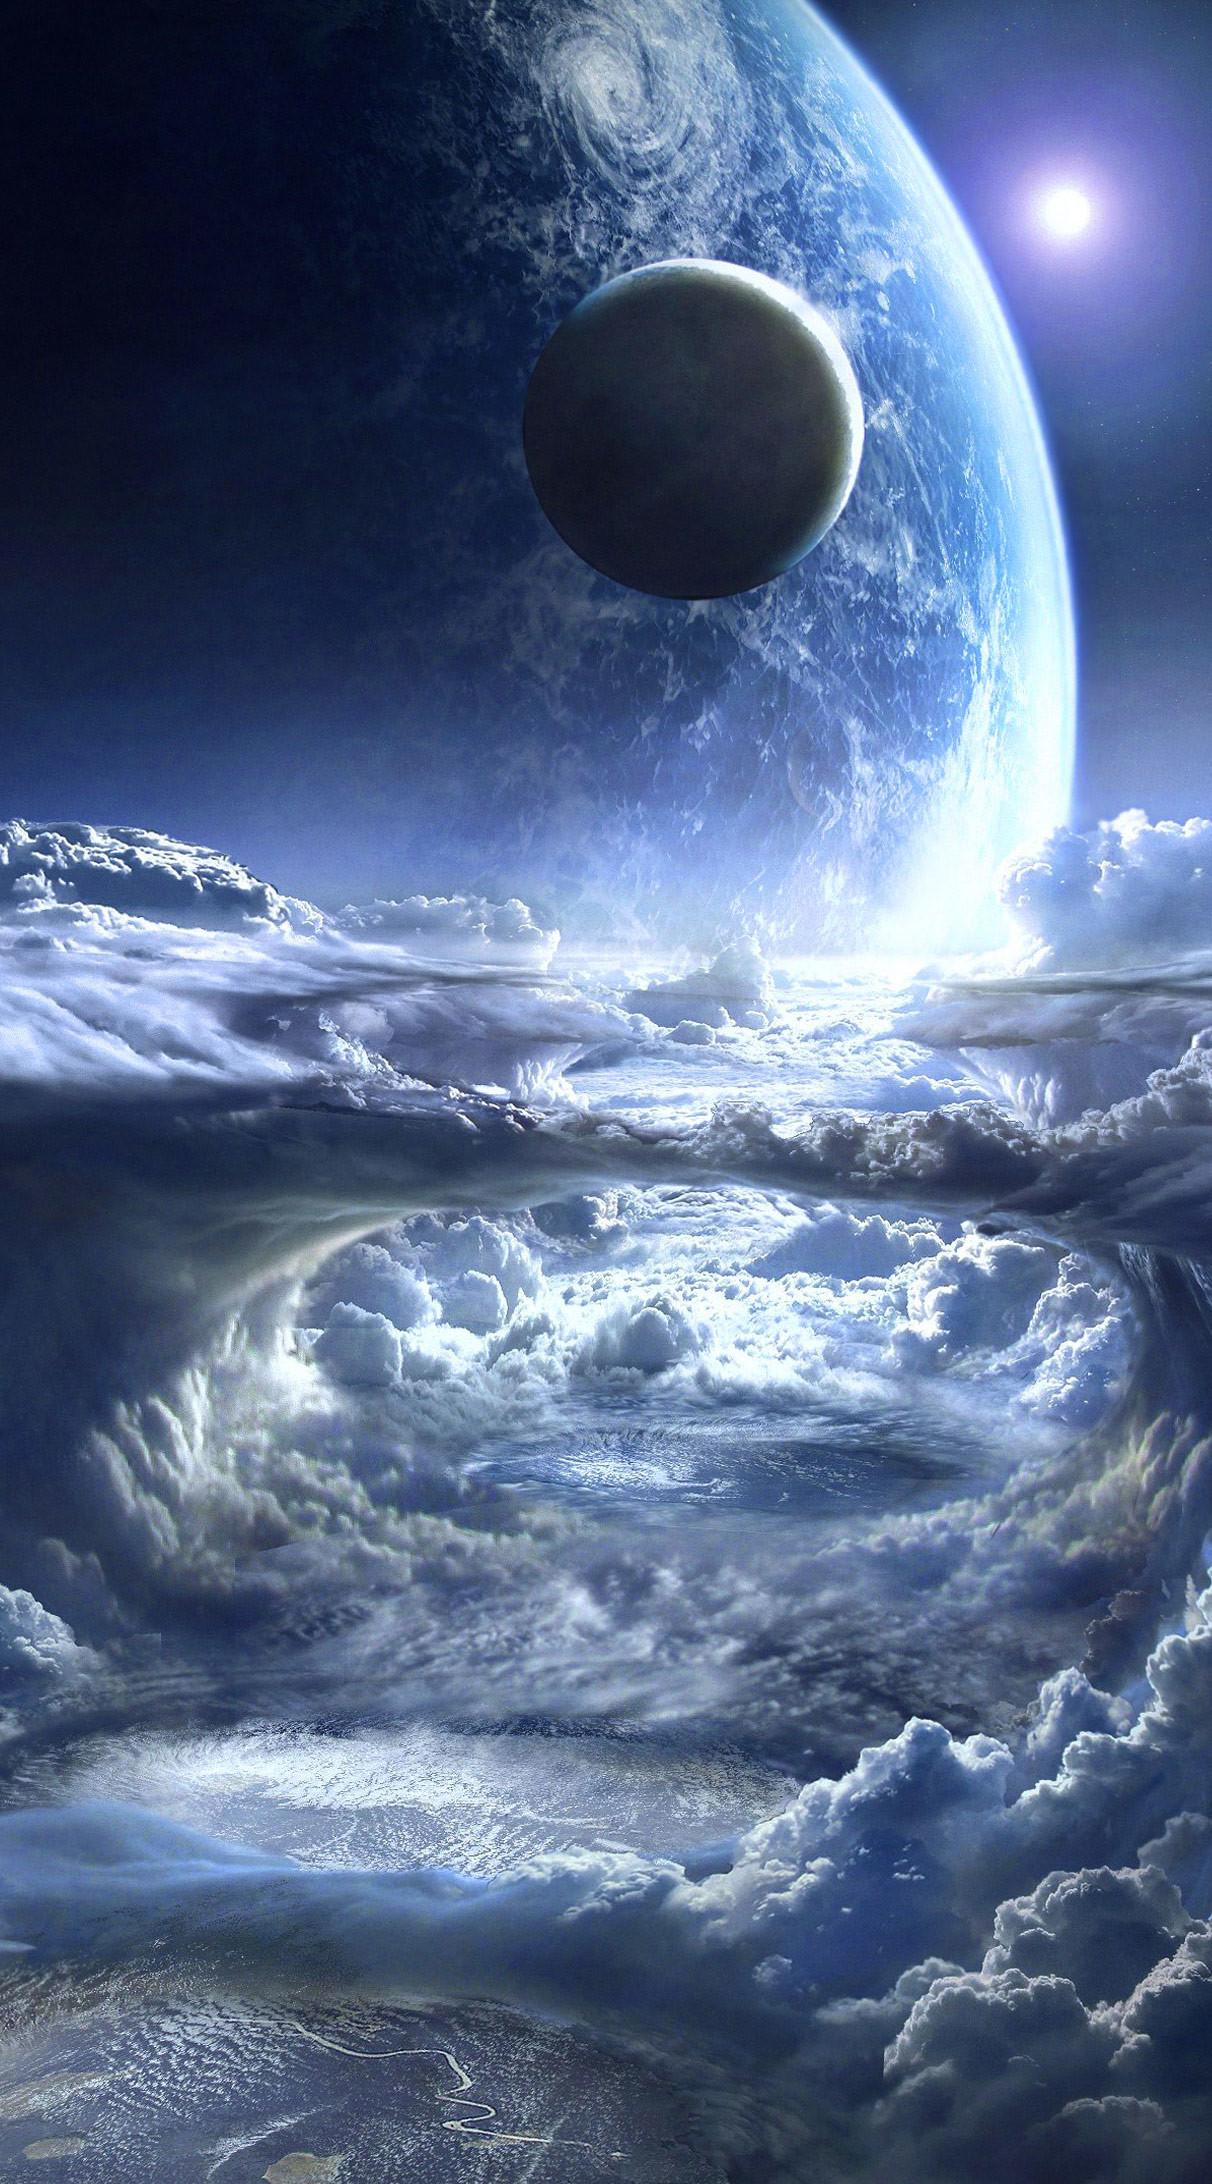 Hd Sci Fi Wallpaper 76 Images